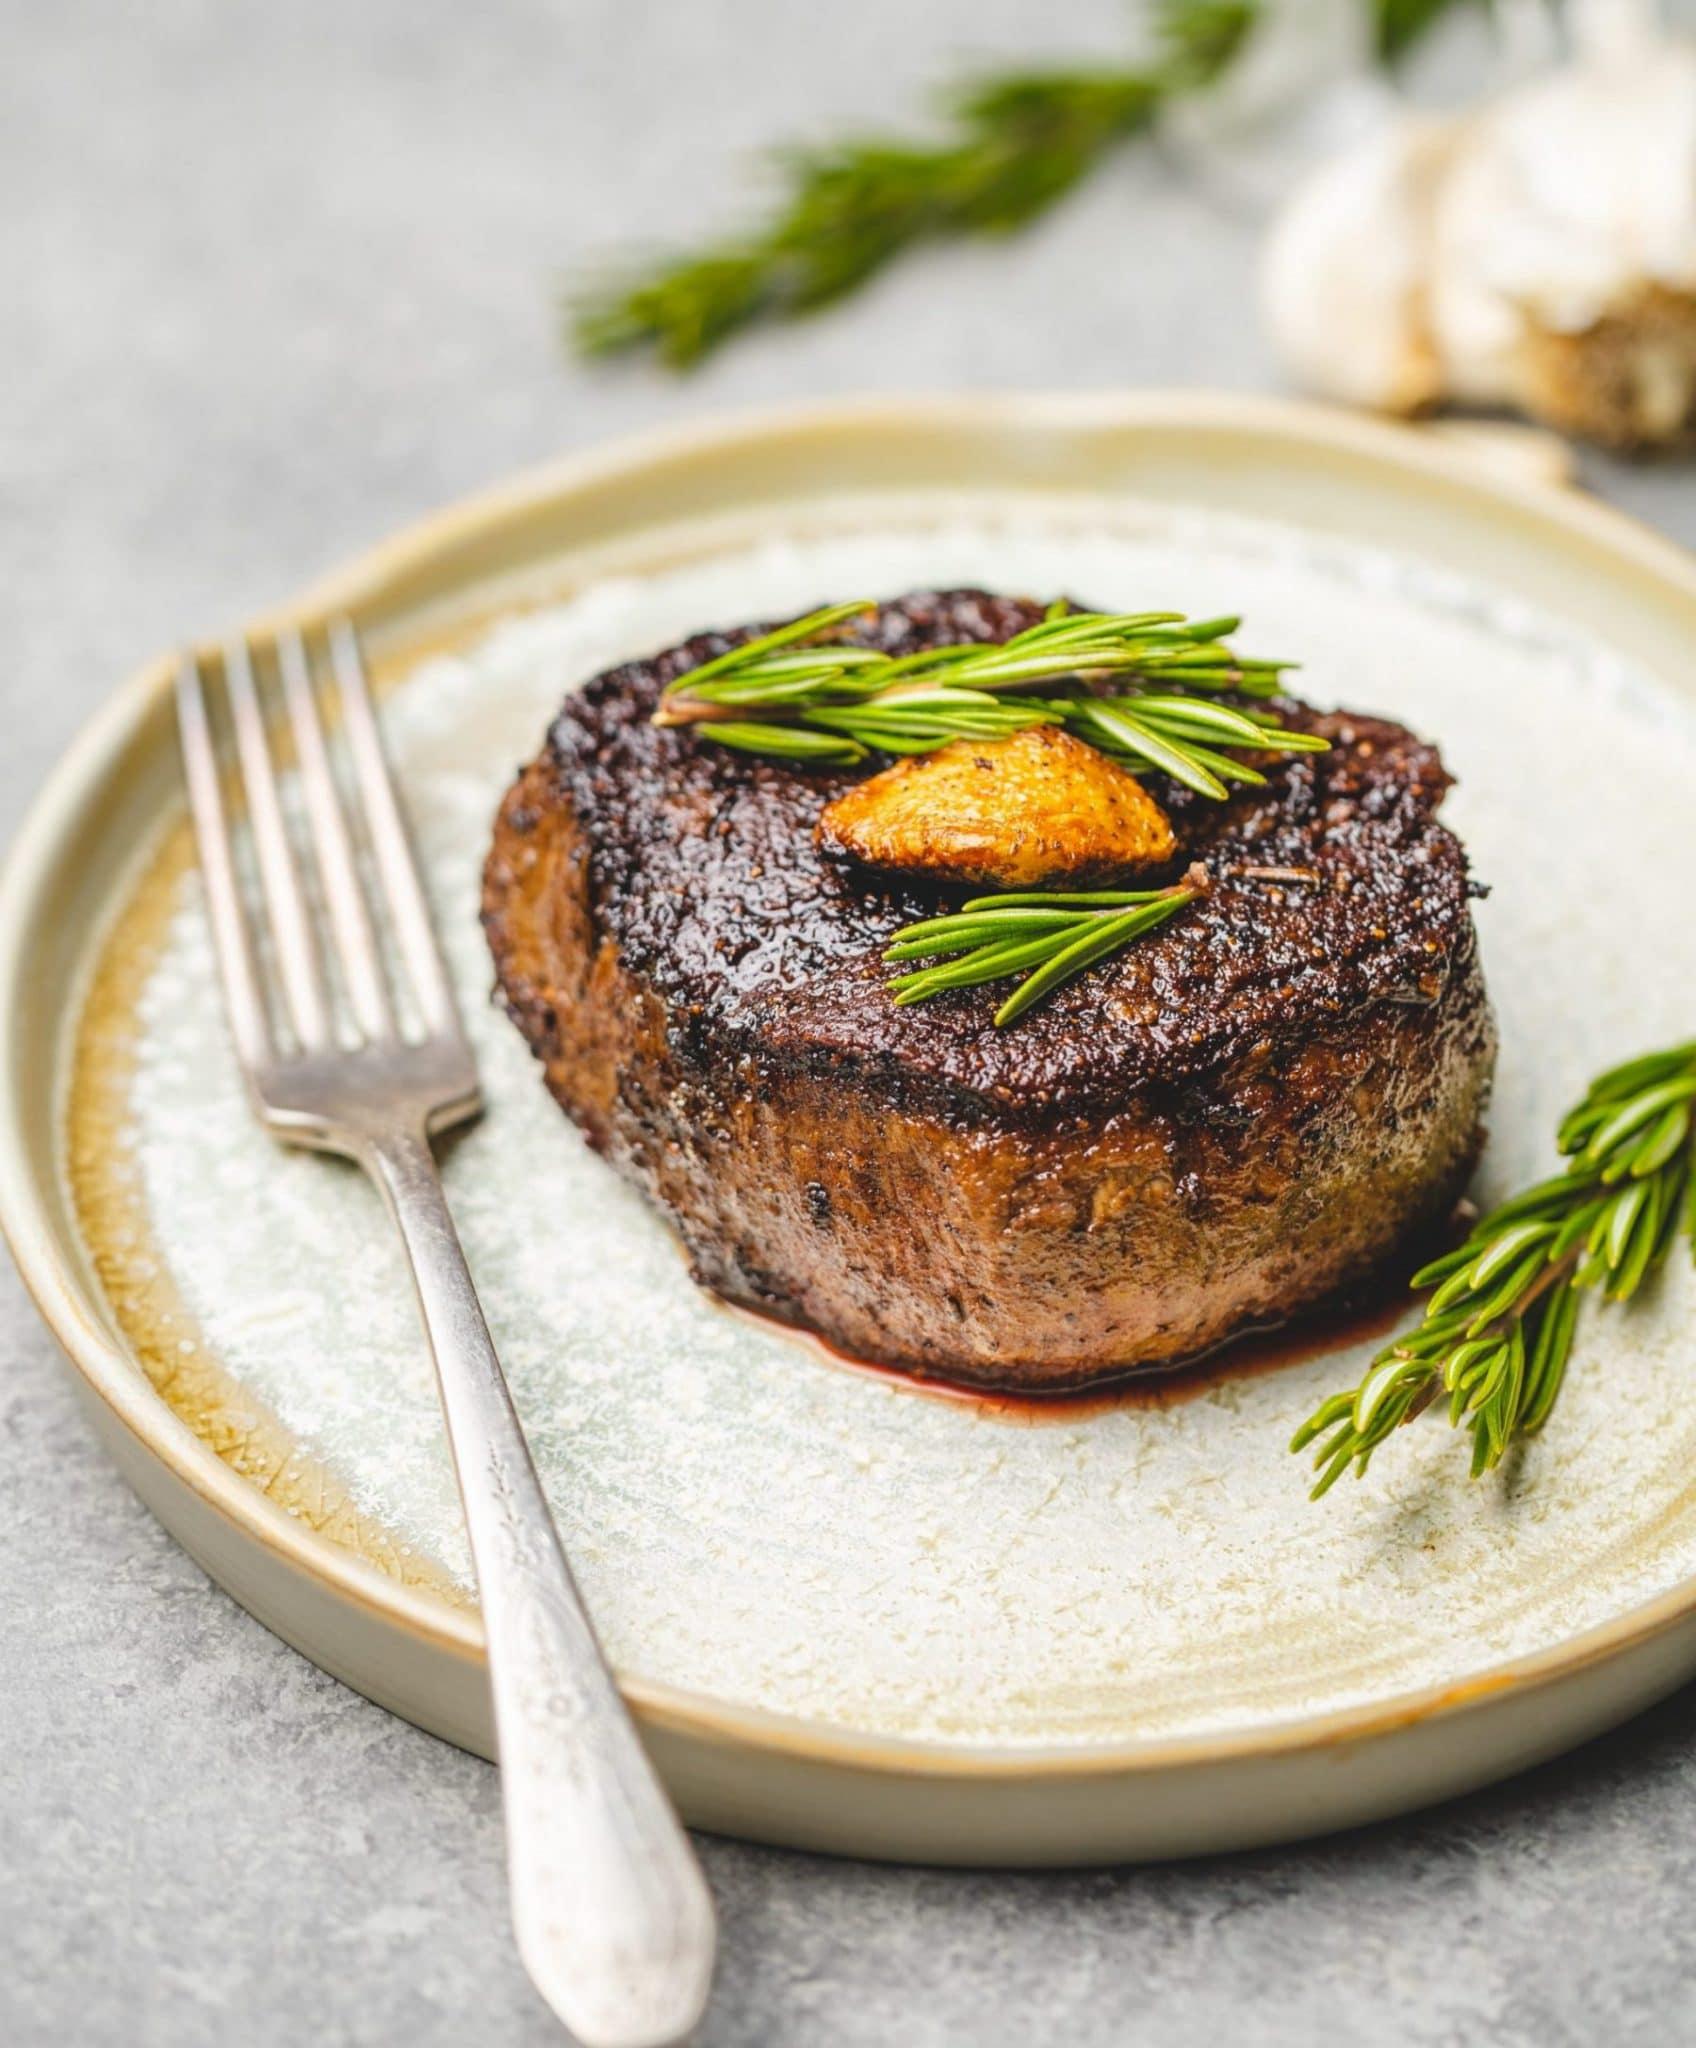 Carnivore Diet2 1 Scaled E1600774807866.jpg